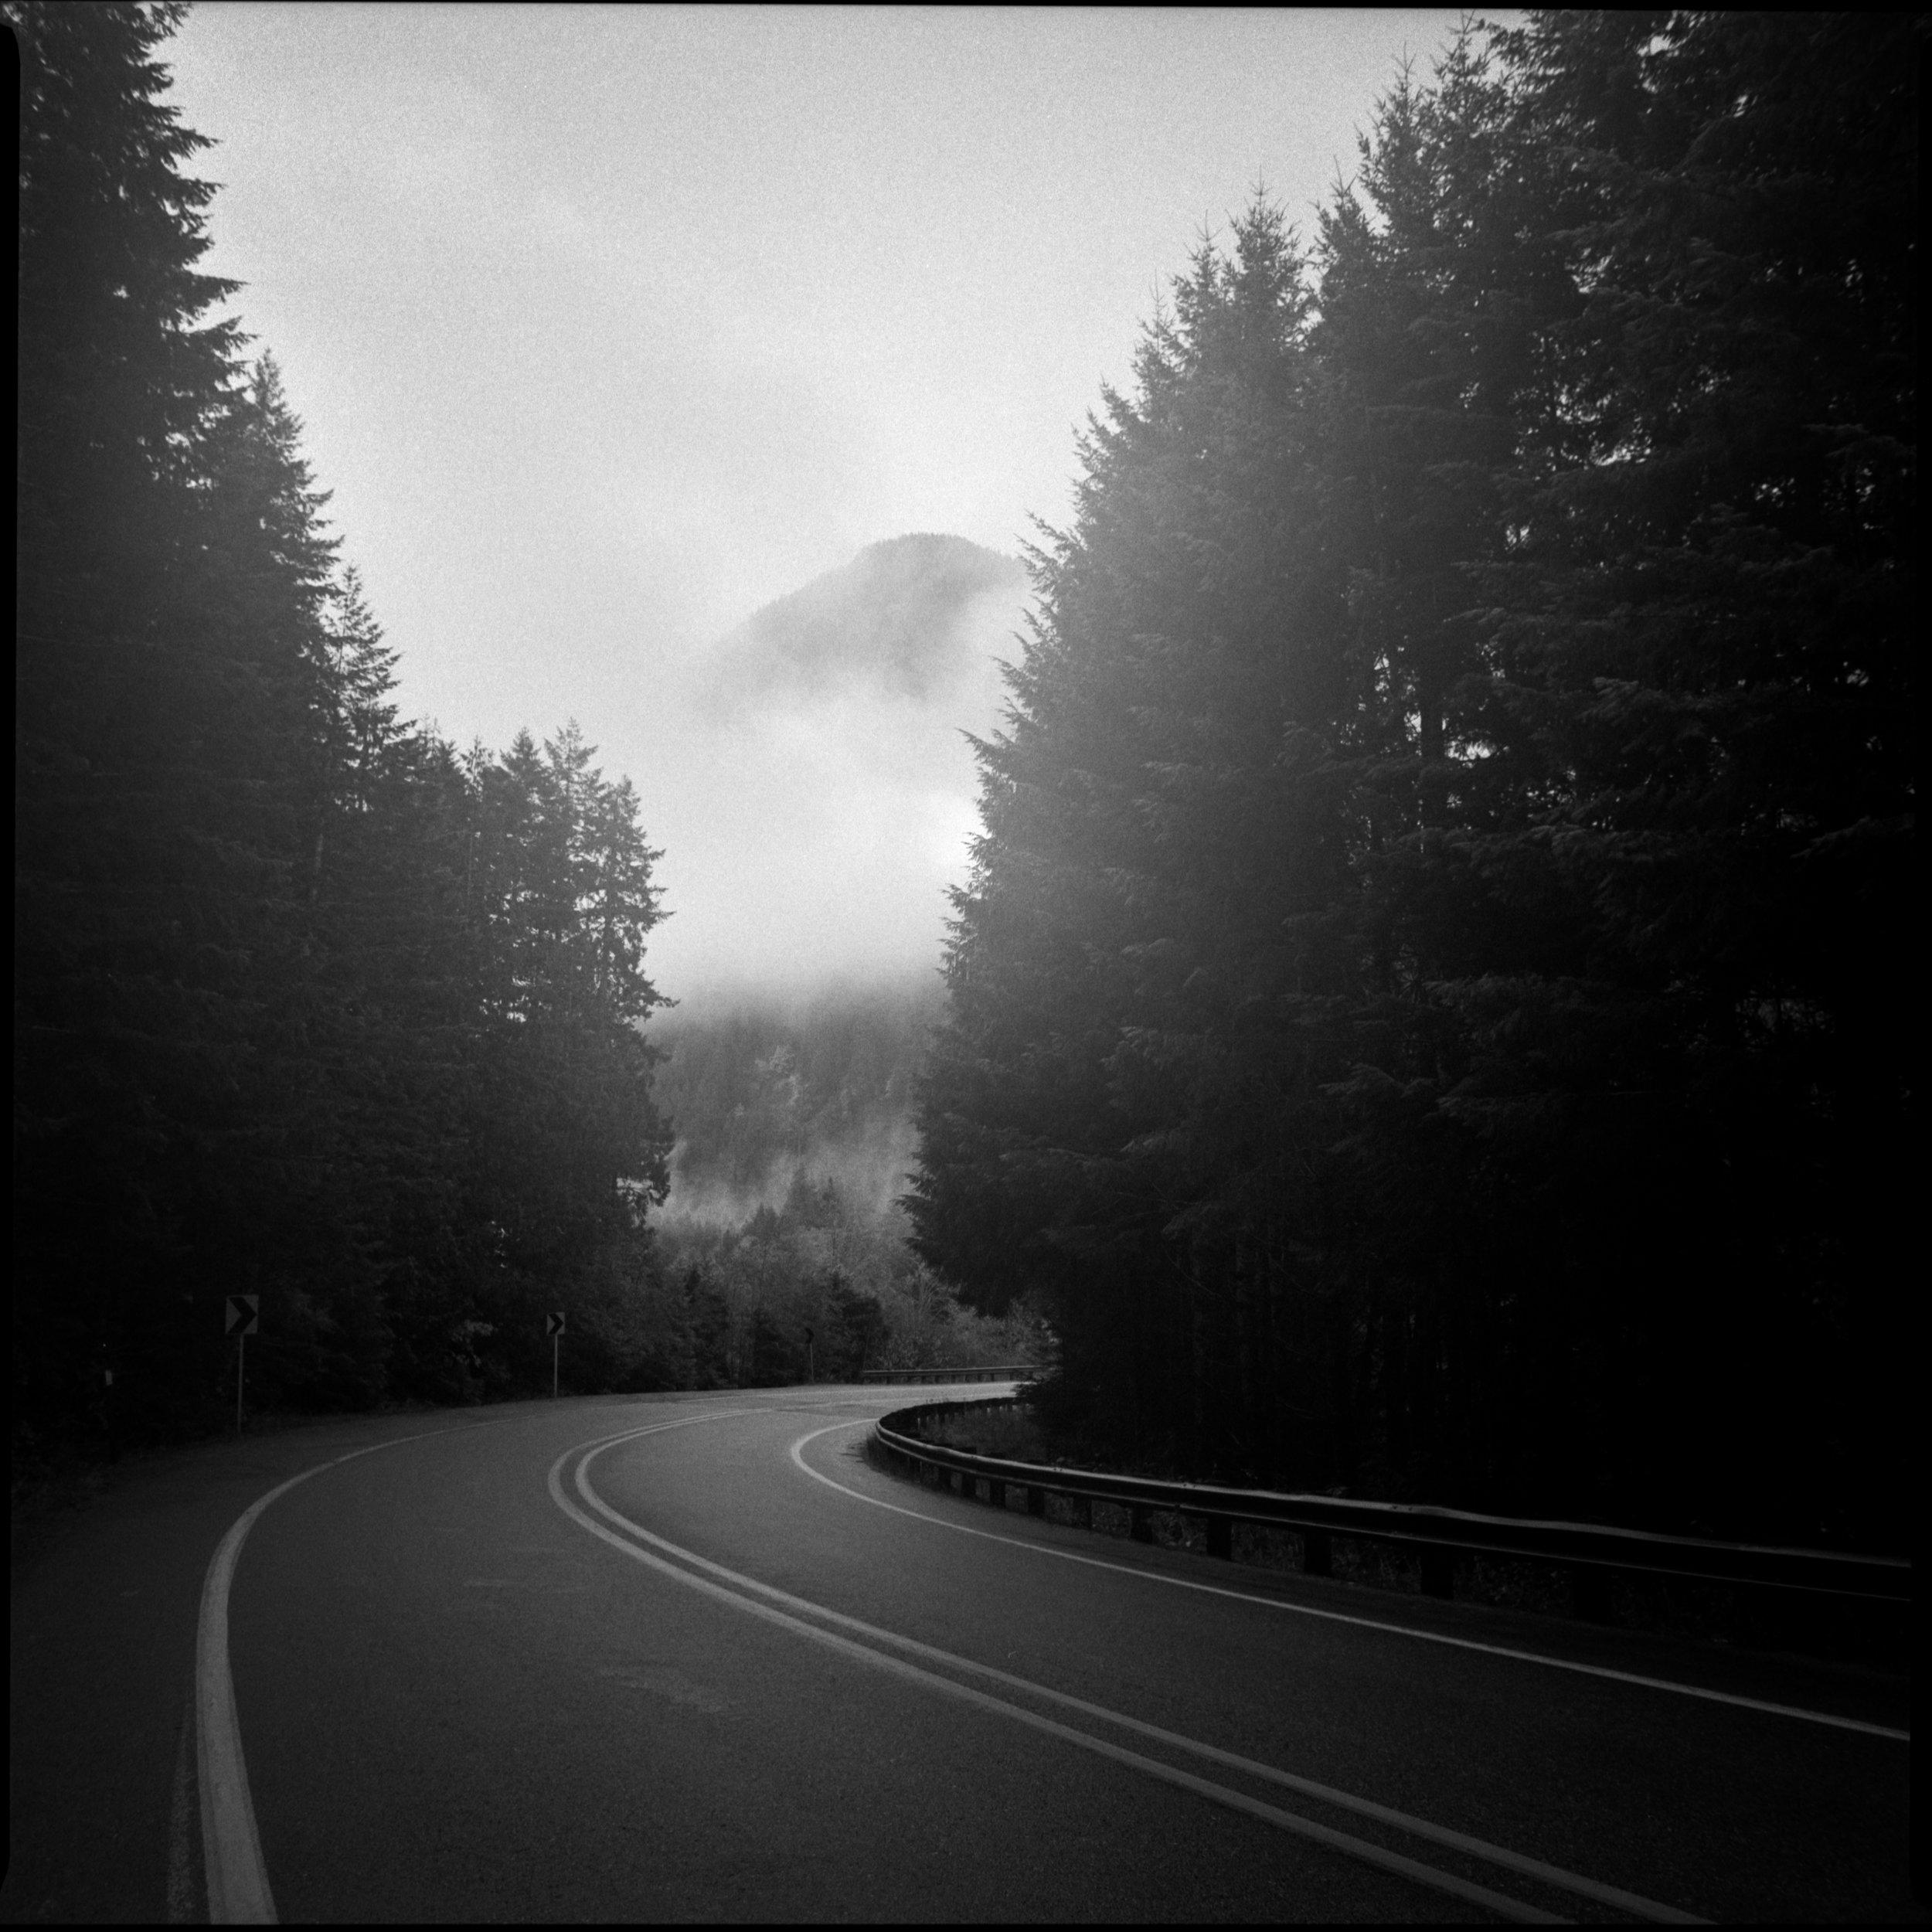 North Cascades Highway, October 2017